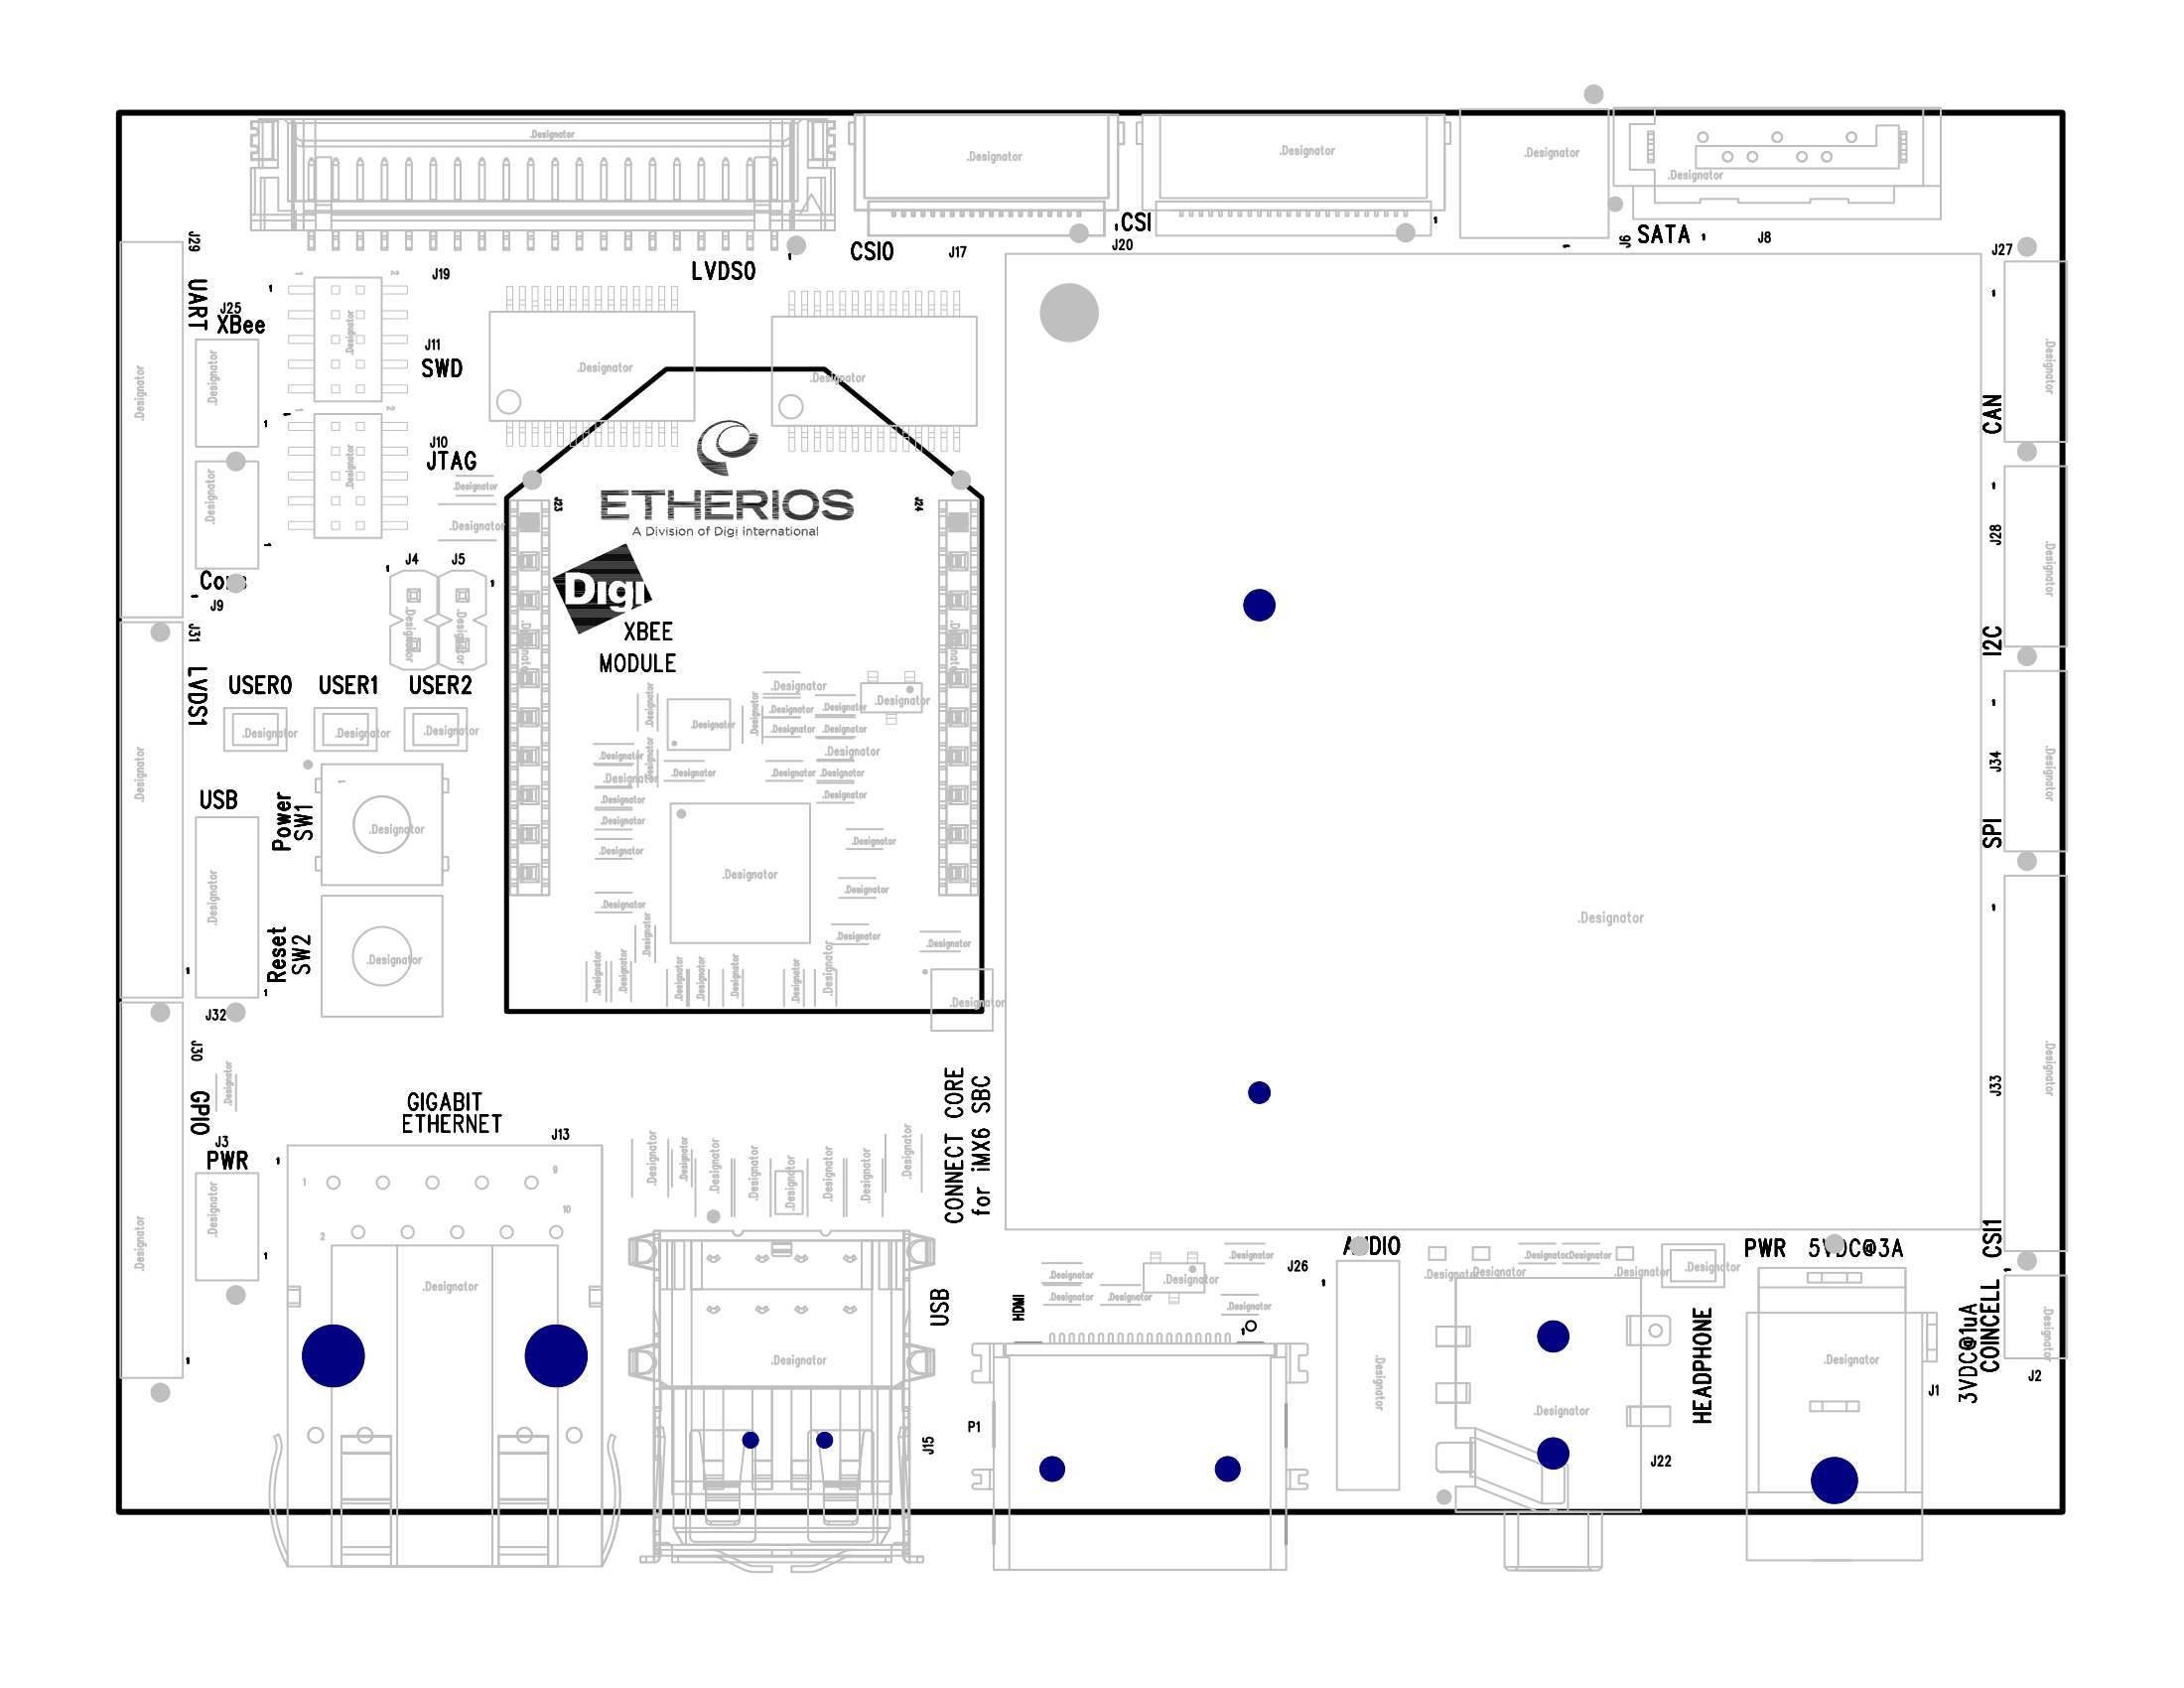 connectcore6 development kit